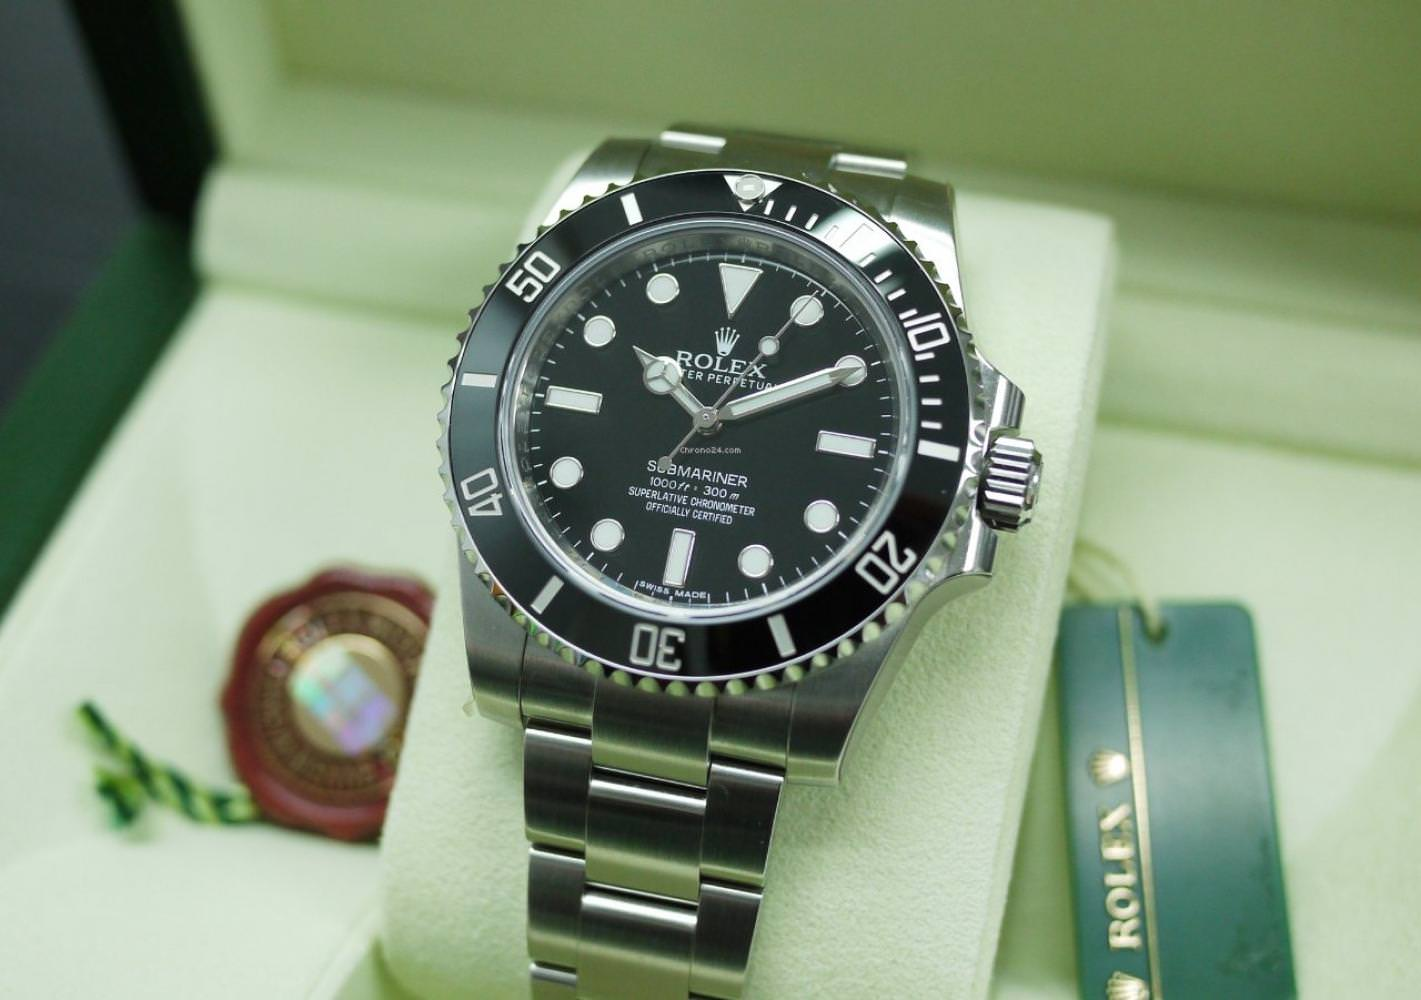 New Rolex Submariner No Date